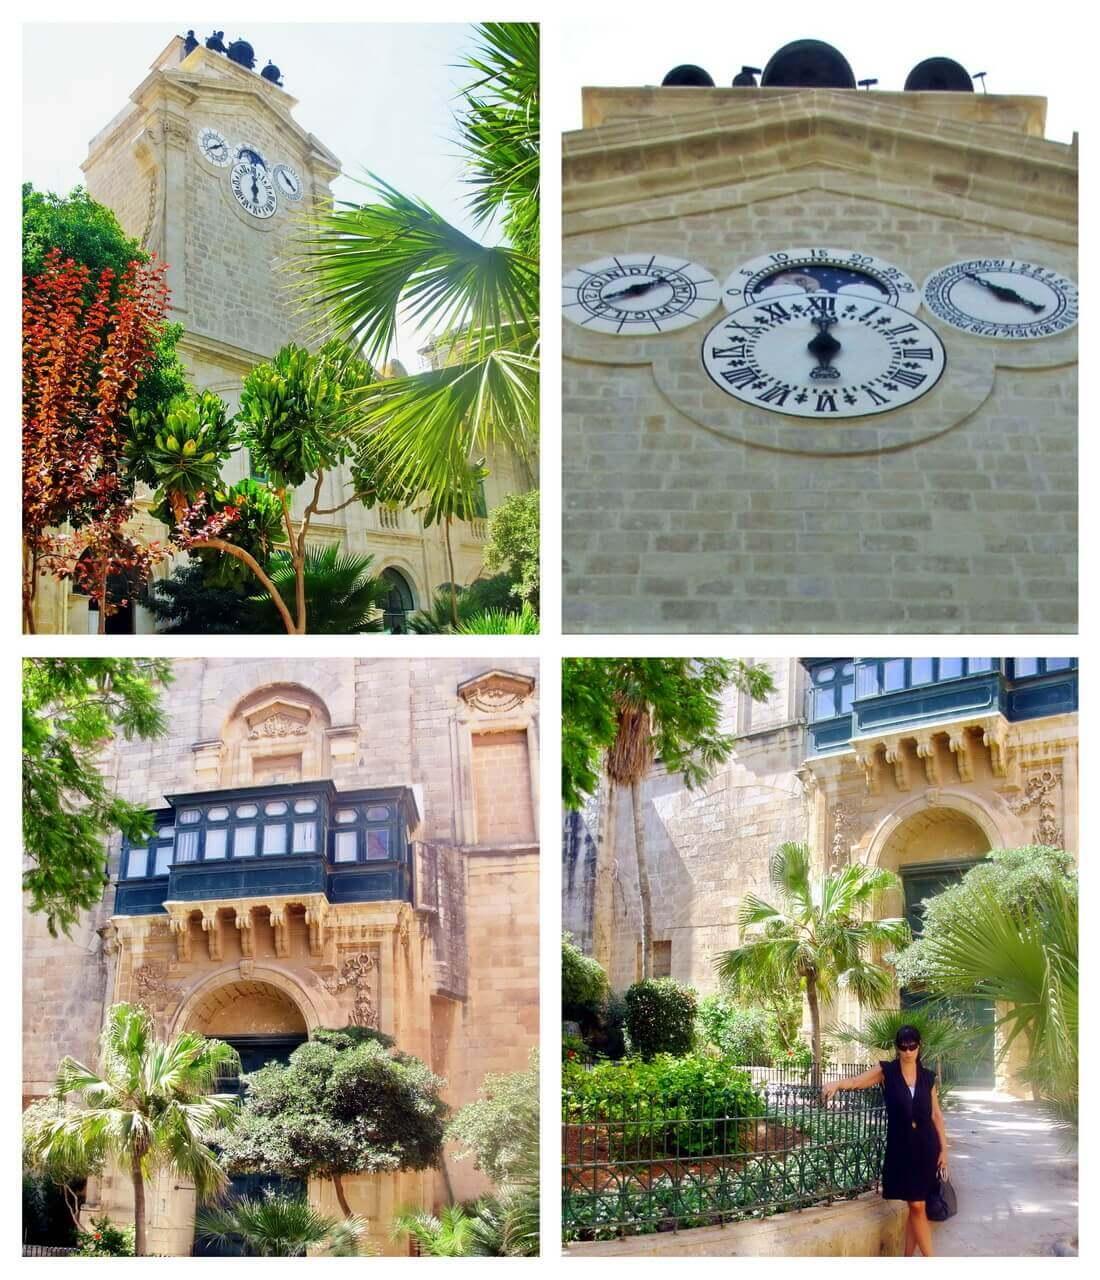 Grand Master's Palace, Pinto's clock, Valletta